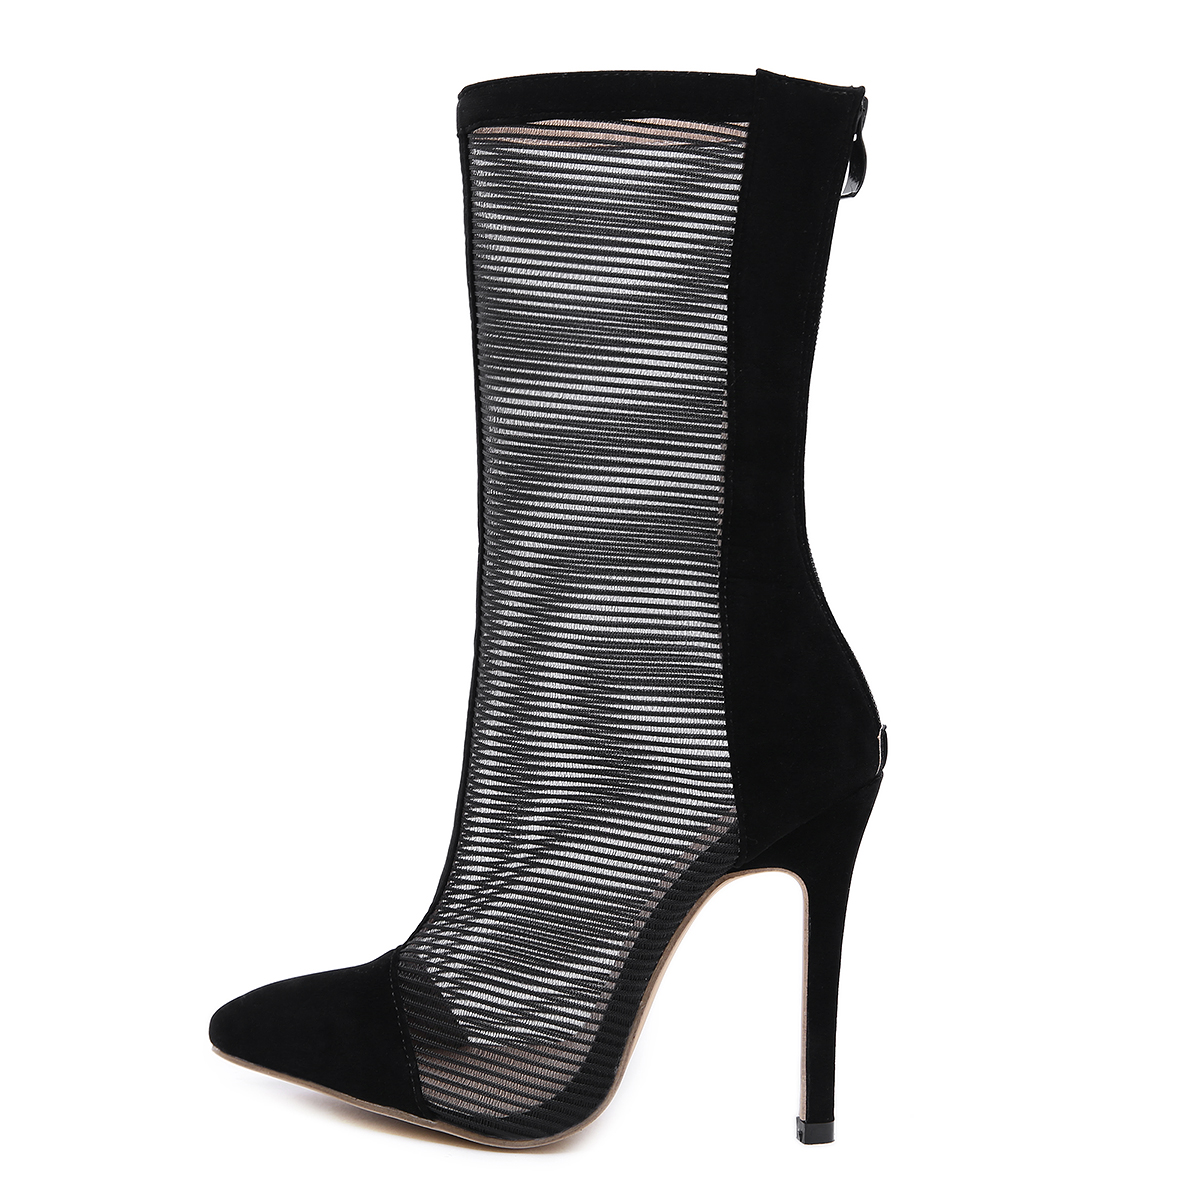 ed9e2d9ef99a ESRFIYFE 2019 New Gladiator Sandals Summer Mesh Mid Calf Boots ...